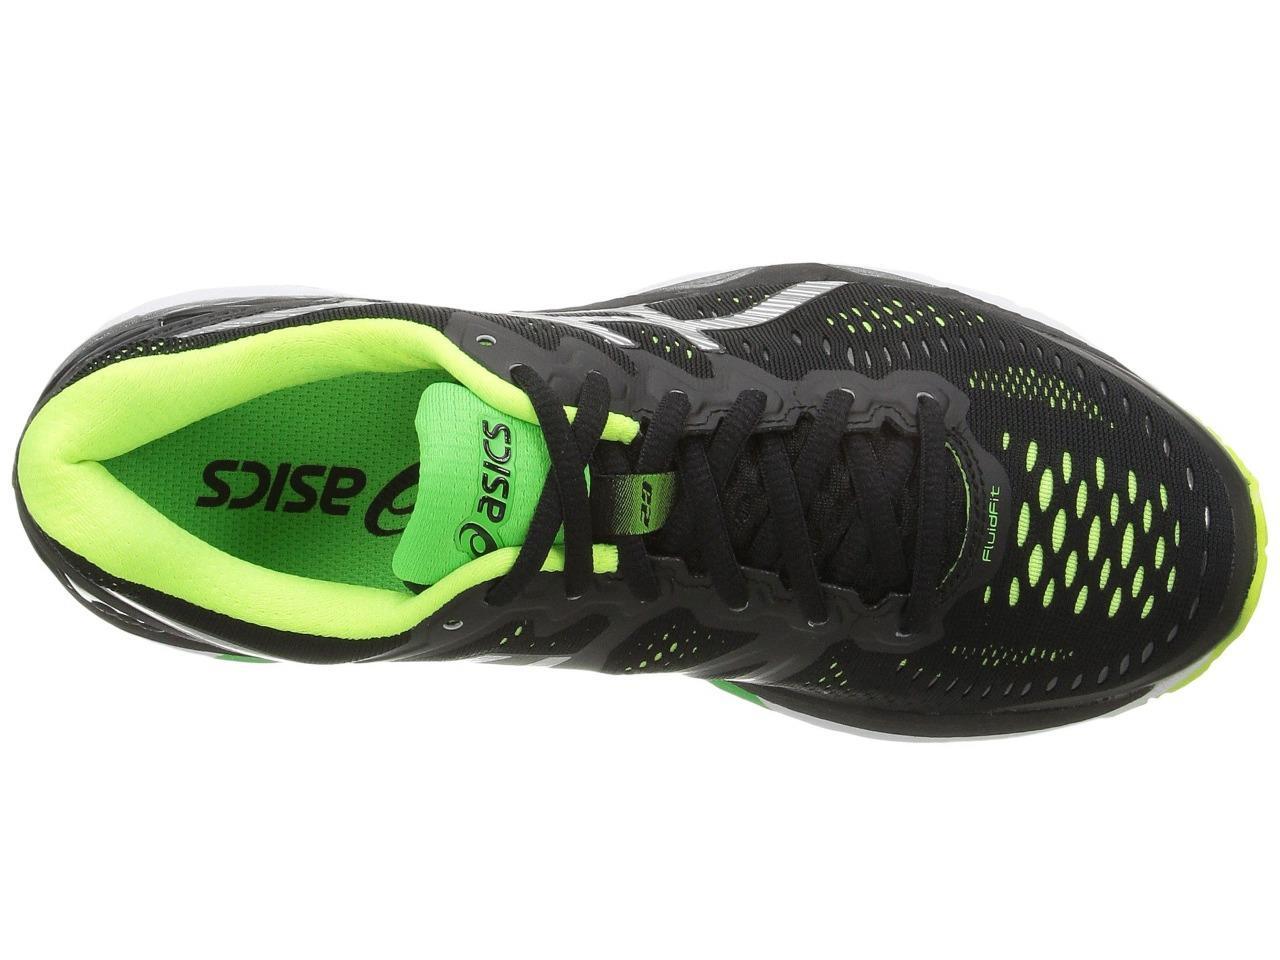 New ASICS Gel Kayano 23 Running Shoes Men s Size 16 Black Silver ... 7eea6696332e4